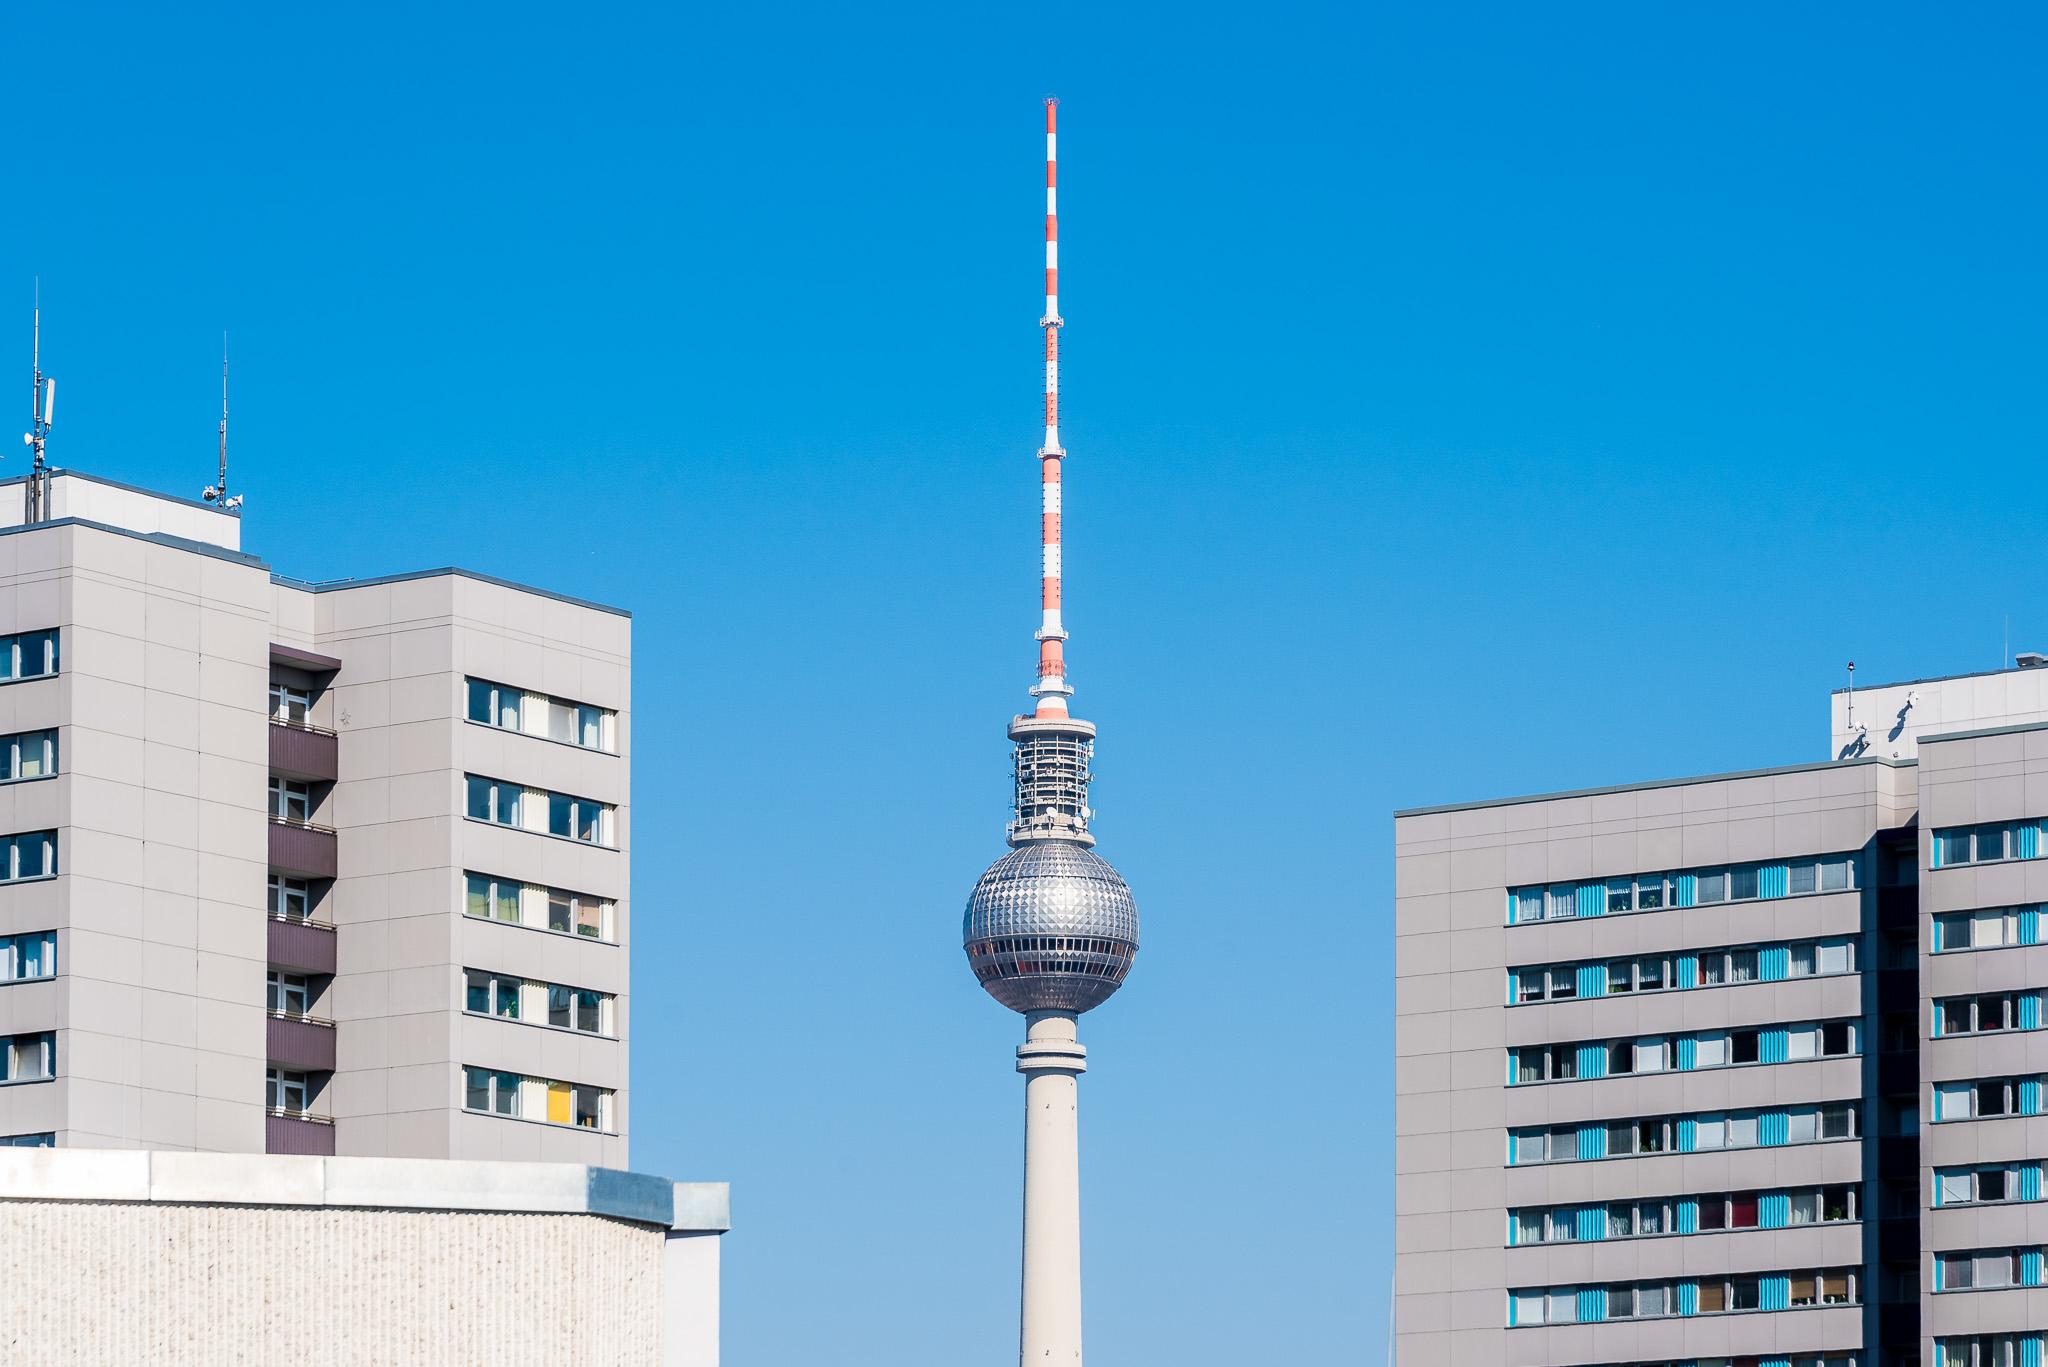 berlin-immobilien-fotograf 0008.JPG